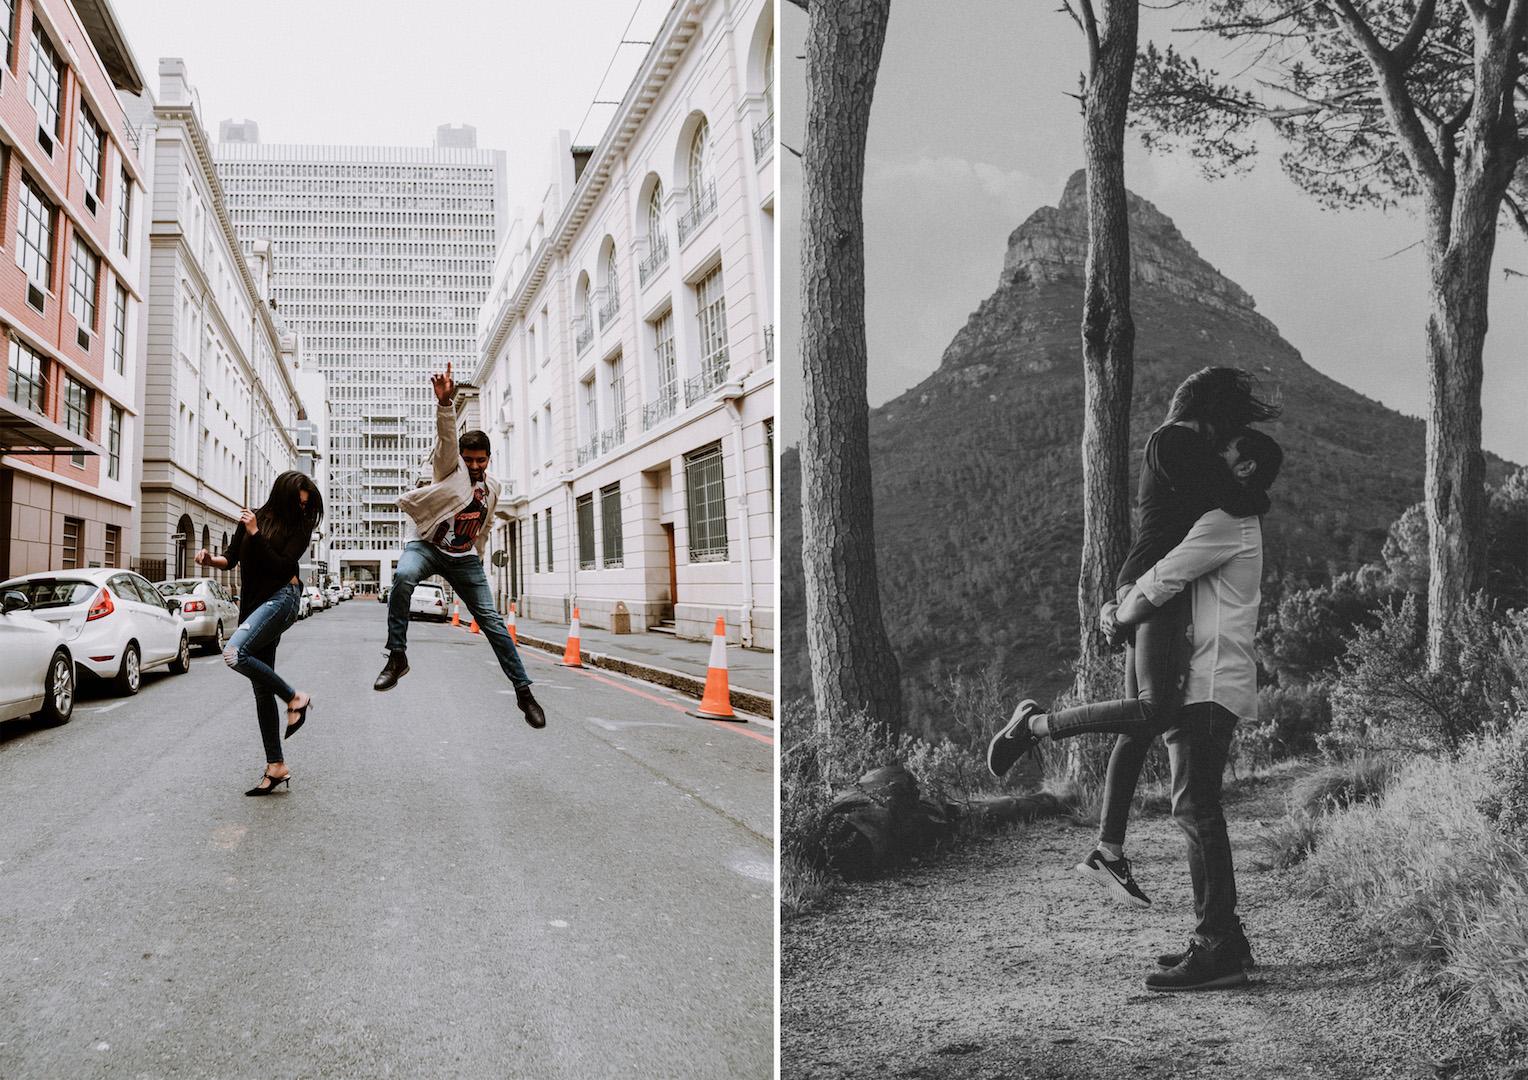 enagement photography cape town 3.jpg